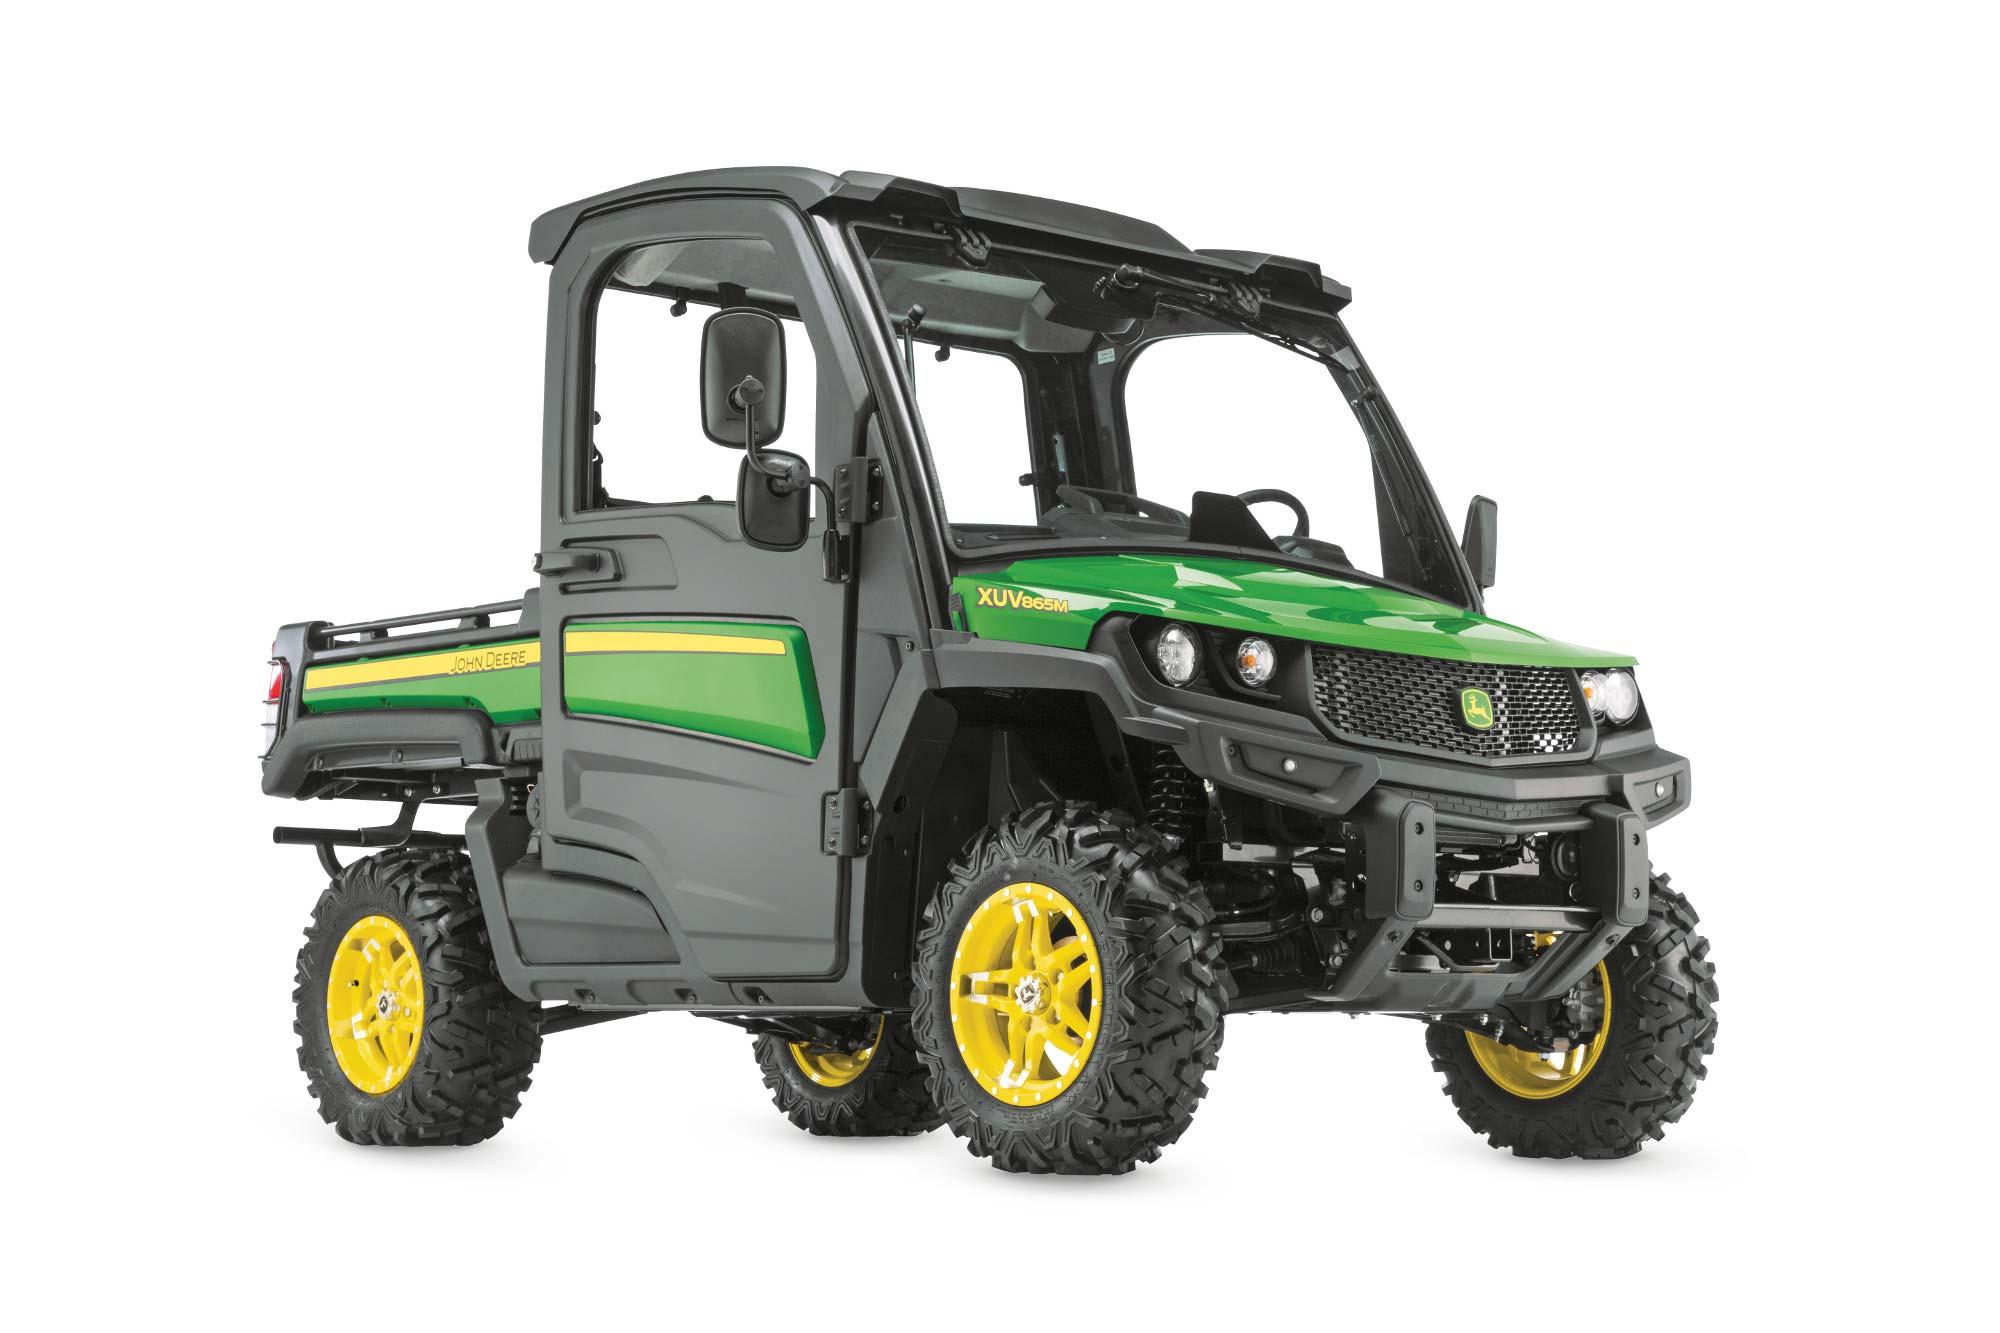 John Deere Gator Prices >> John Deere Gator XUV865M - Powercut